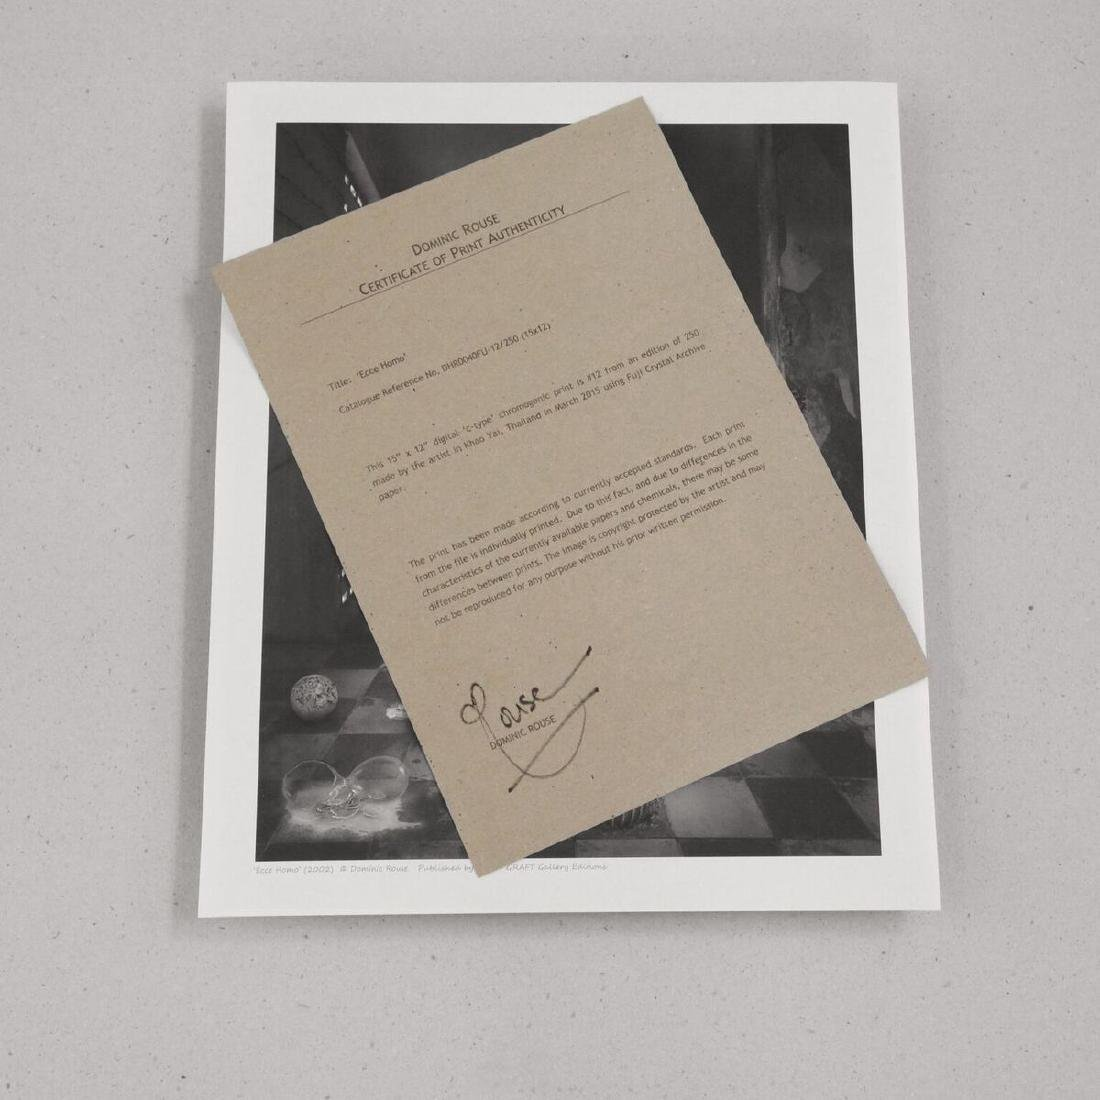 Dominic Rouse Chromogenic Print Ecce Homo - 3